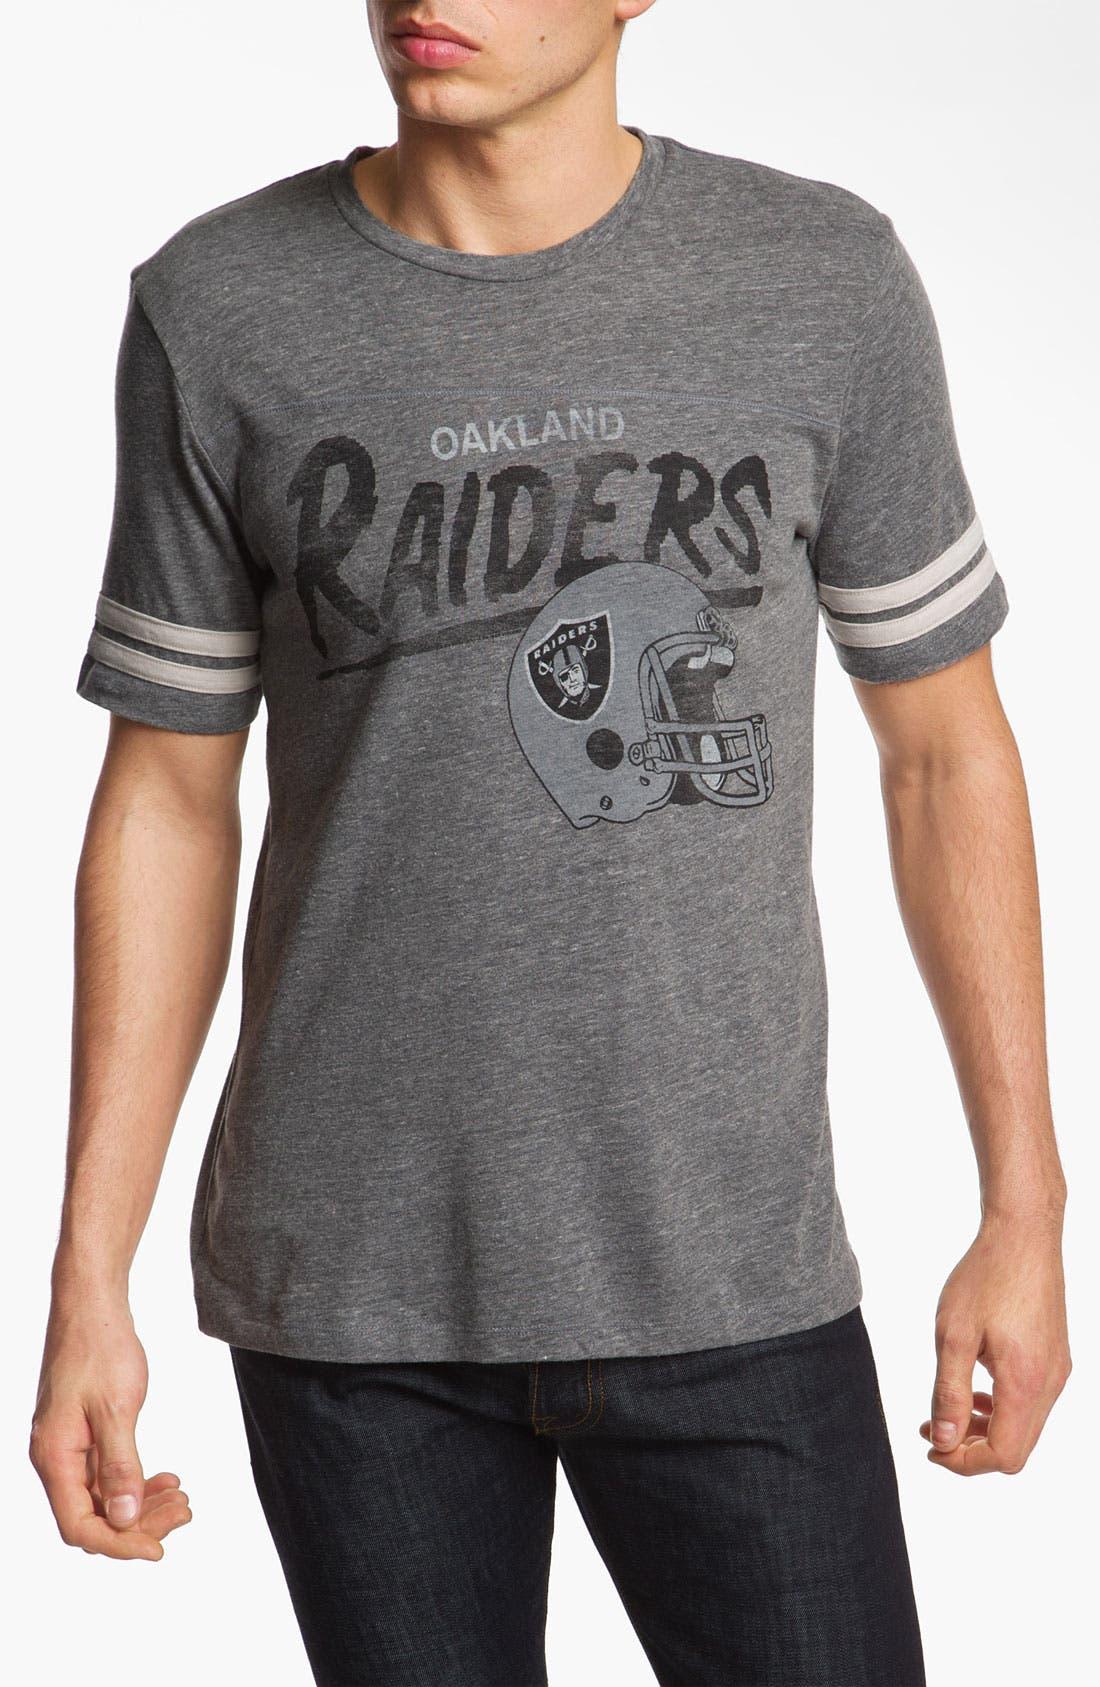 Alternate Image 1 Selected - Junk Food 'Oakland Raiders' T-Shirt